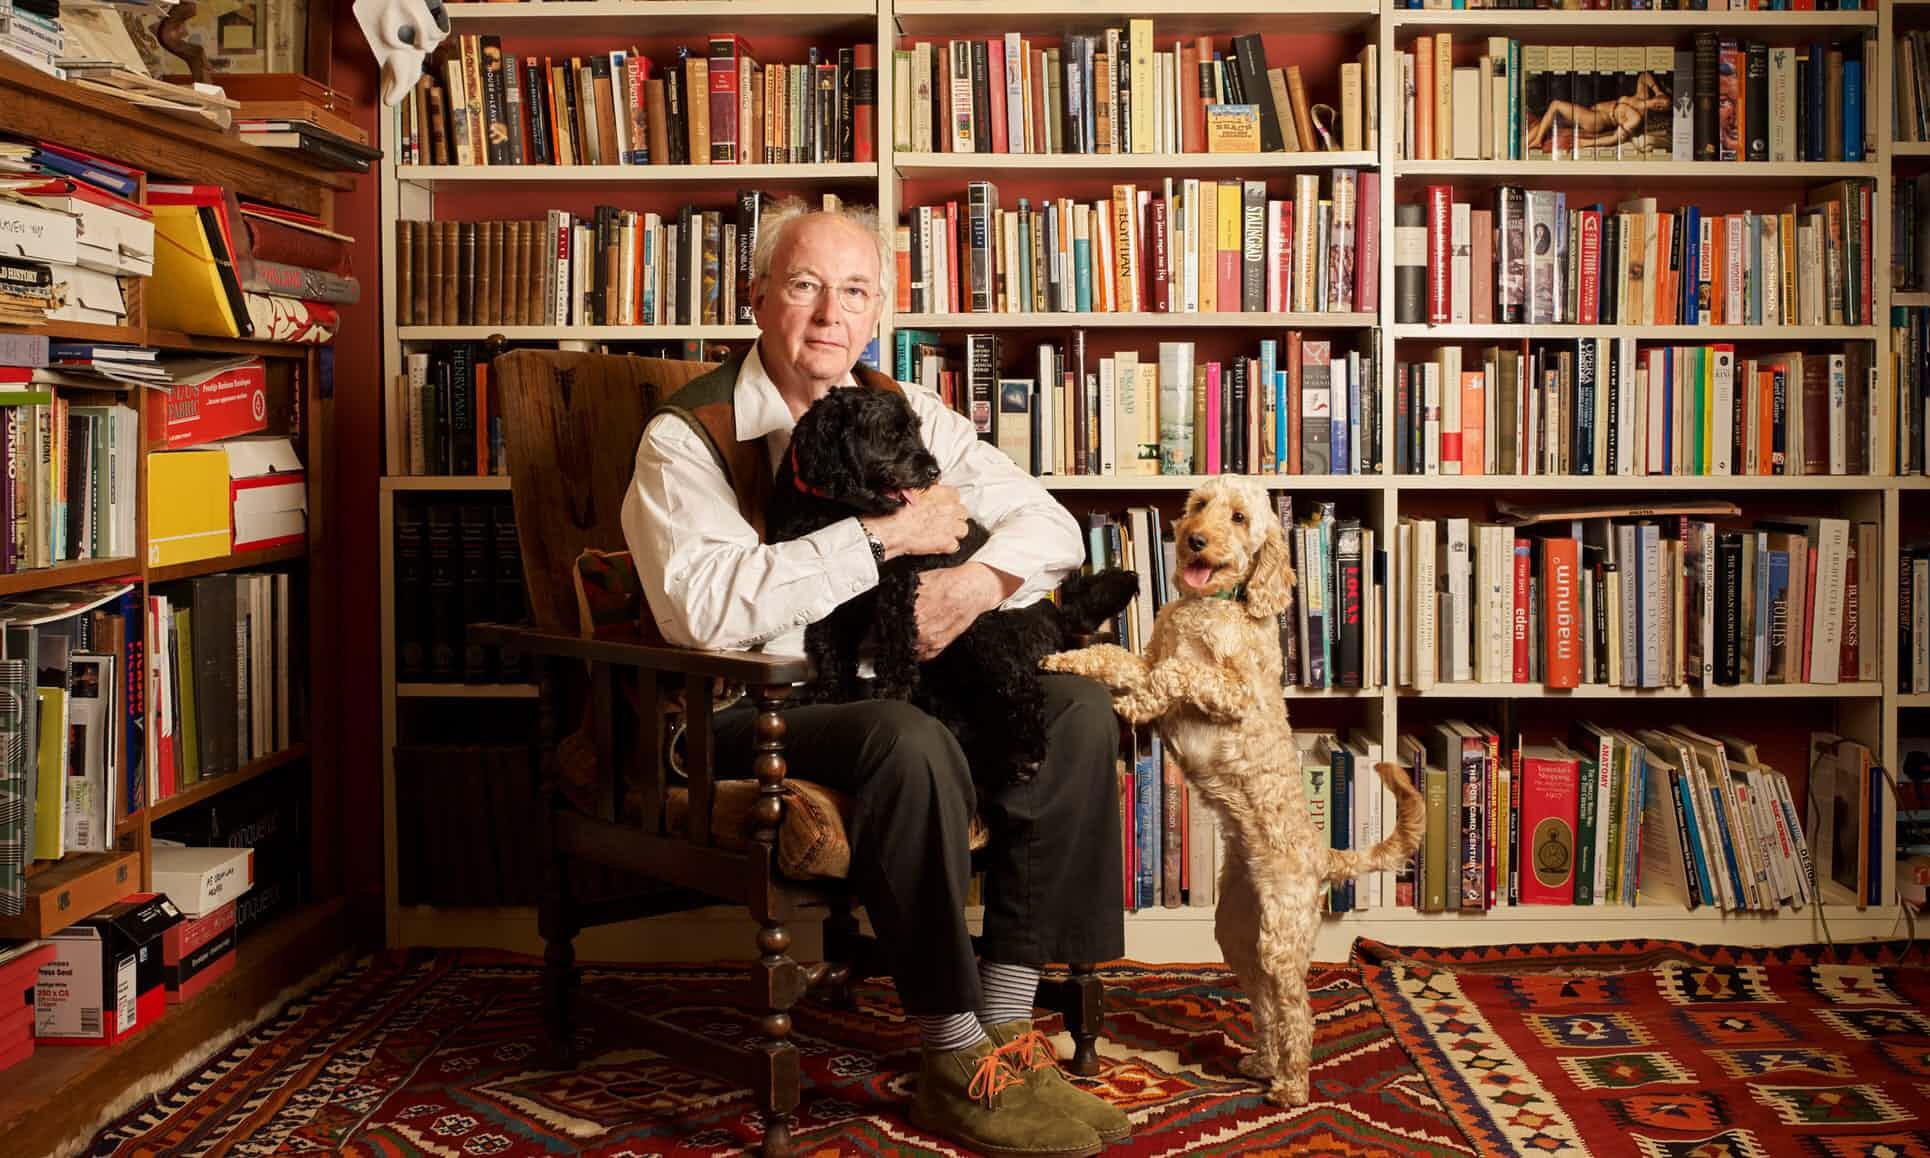 Philip Pullman on Book of Dust